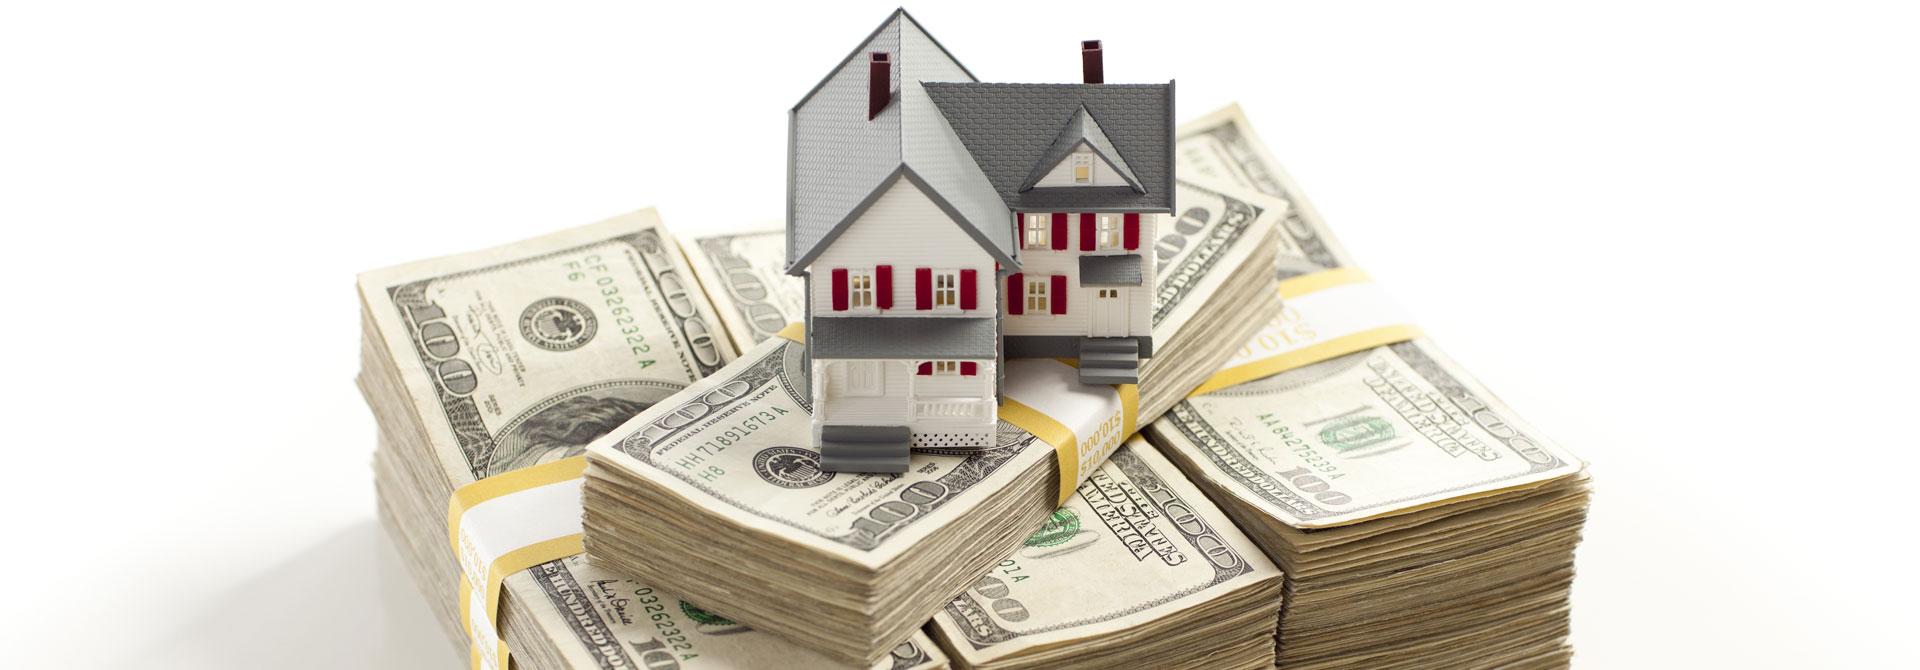 Sagamore payday loans image 9